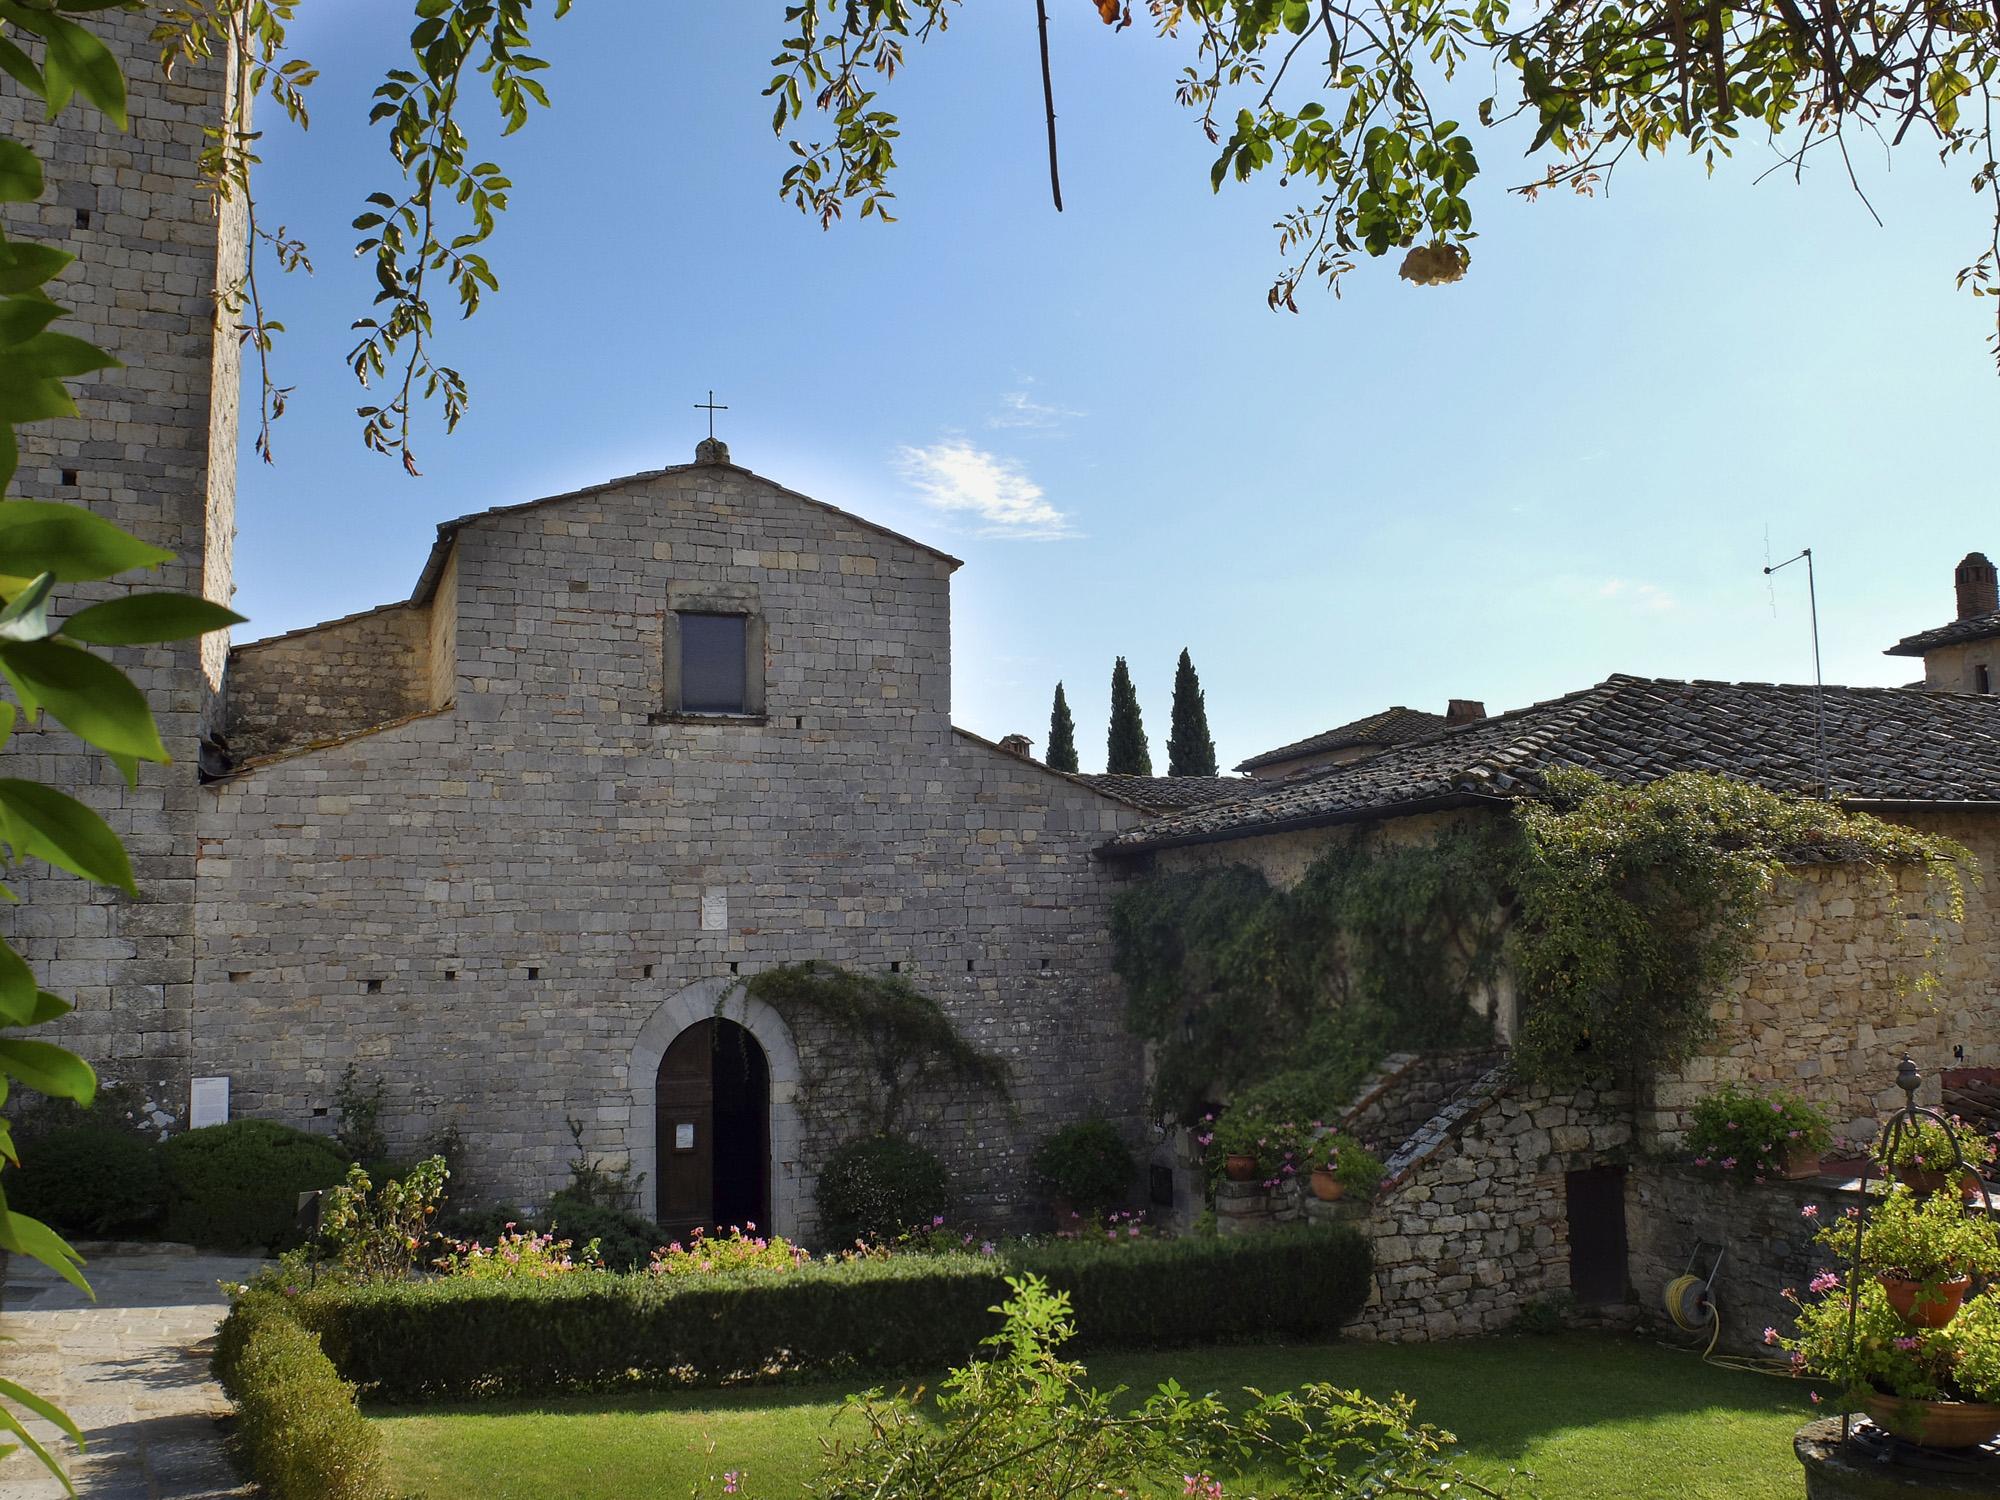 The Pieve di Spaltenna